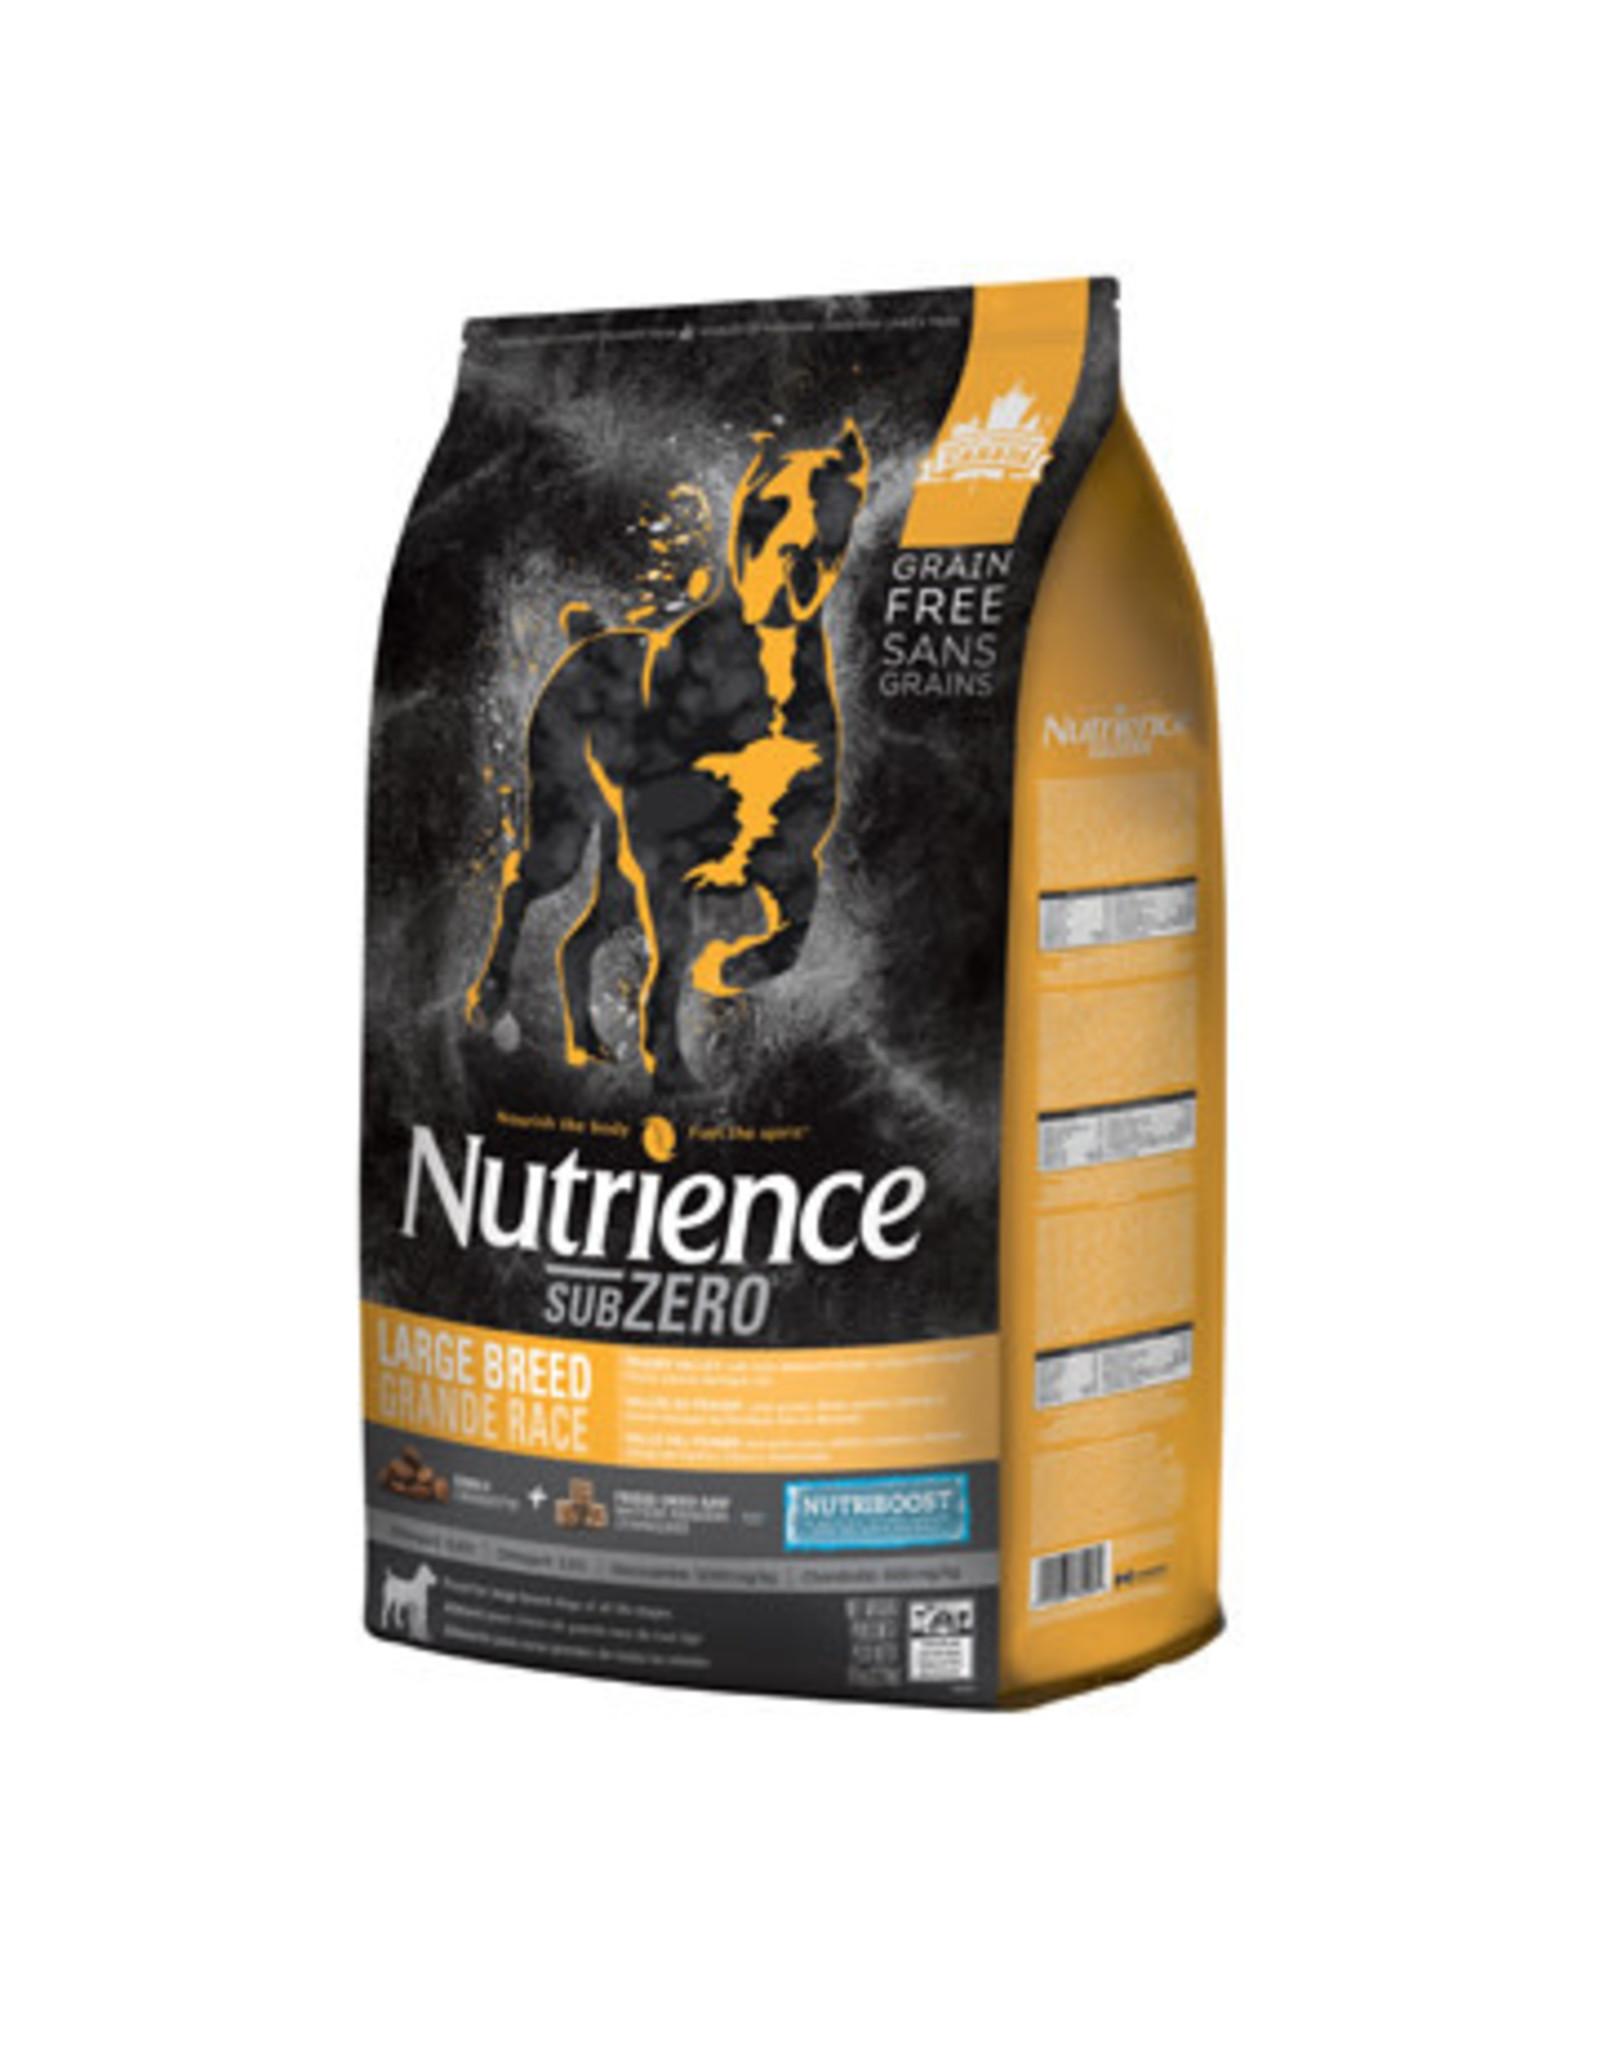 Nutrience Nutrience SubZero Large Breed Fraser Valley - 10kg